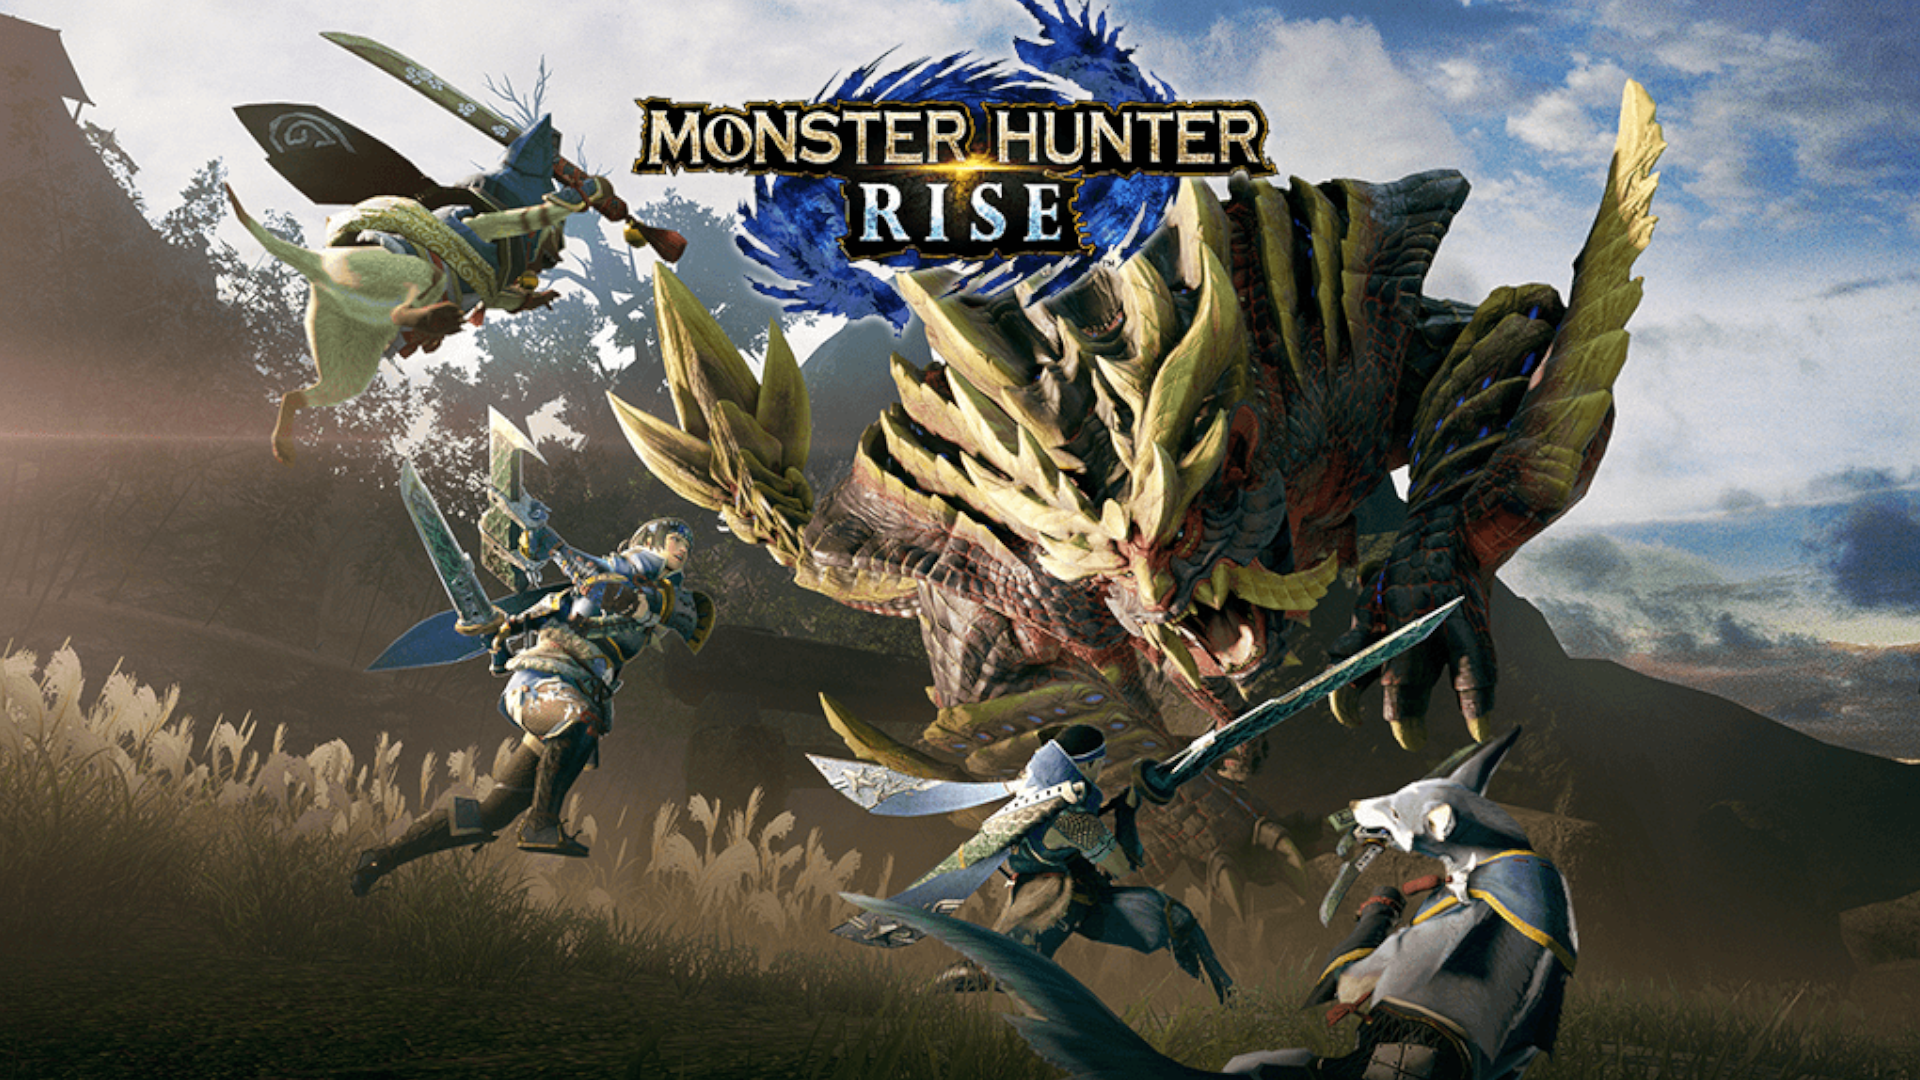 Monster Hunter Rise Wallpapers - Top Free Monster Hunter Rise Backgrounds -  WallpaperAccess